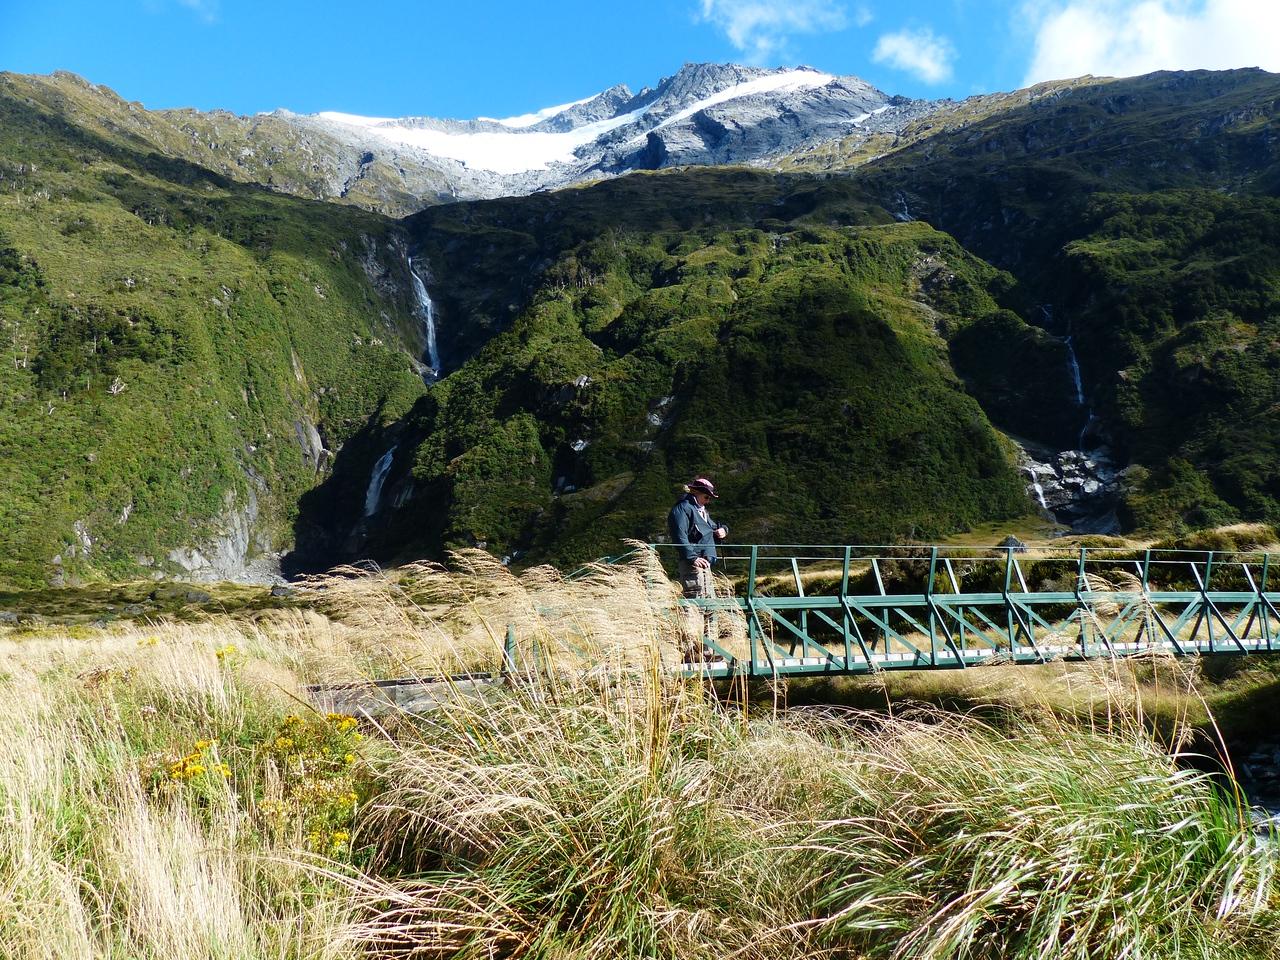 Mt. Aspiring backpack - Waterfalls  and streams.